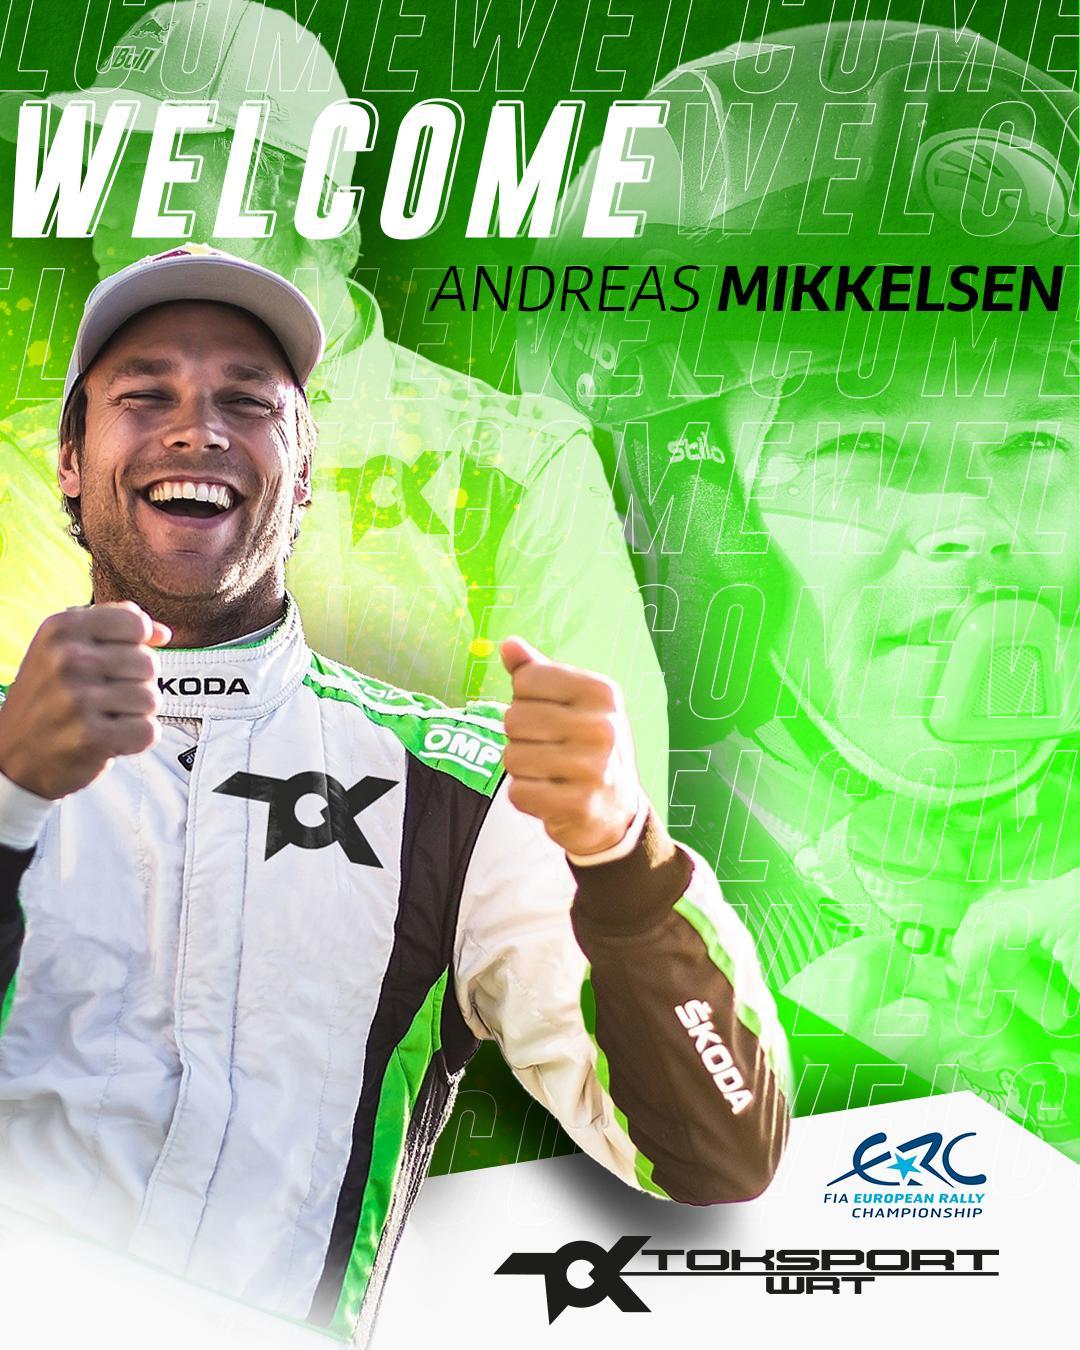 FIA European Rally Championship: Temporada 2021 EqPR6XJXEAE3ukA?format=jpg&name=large